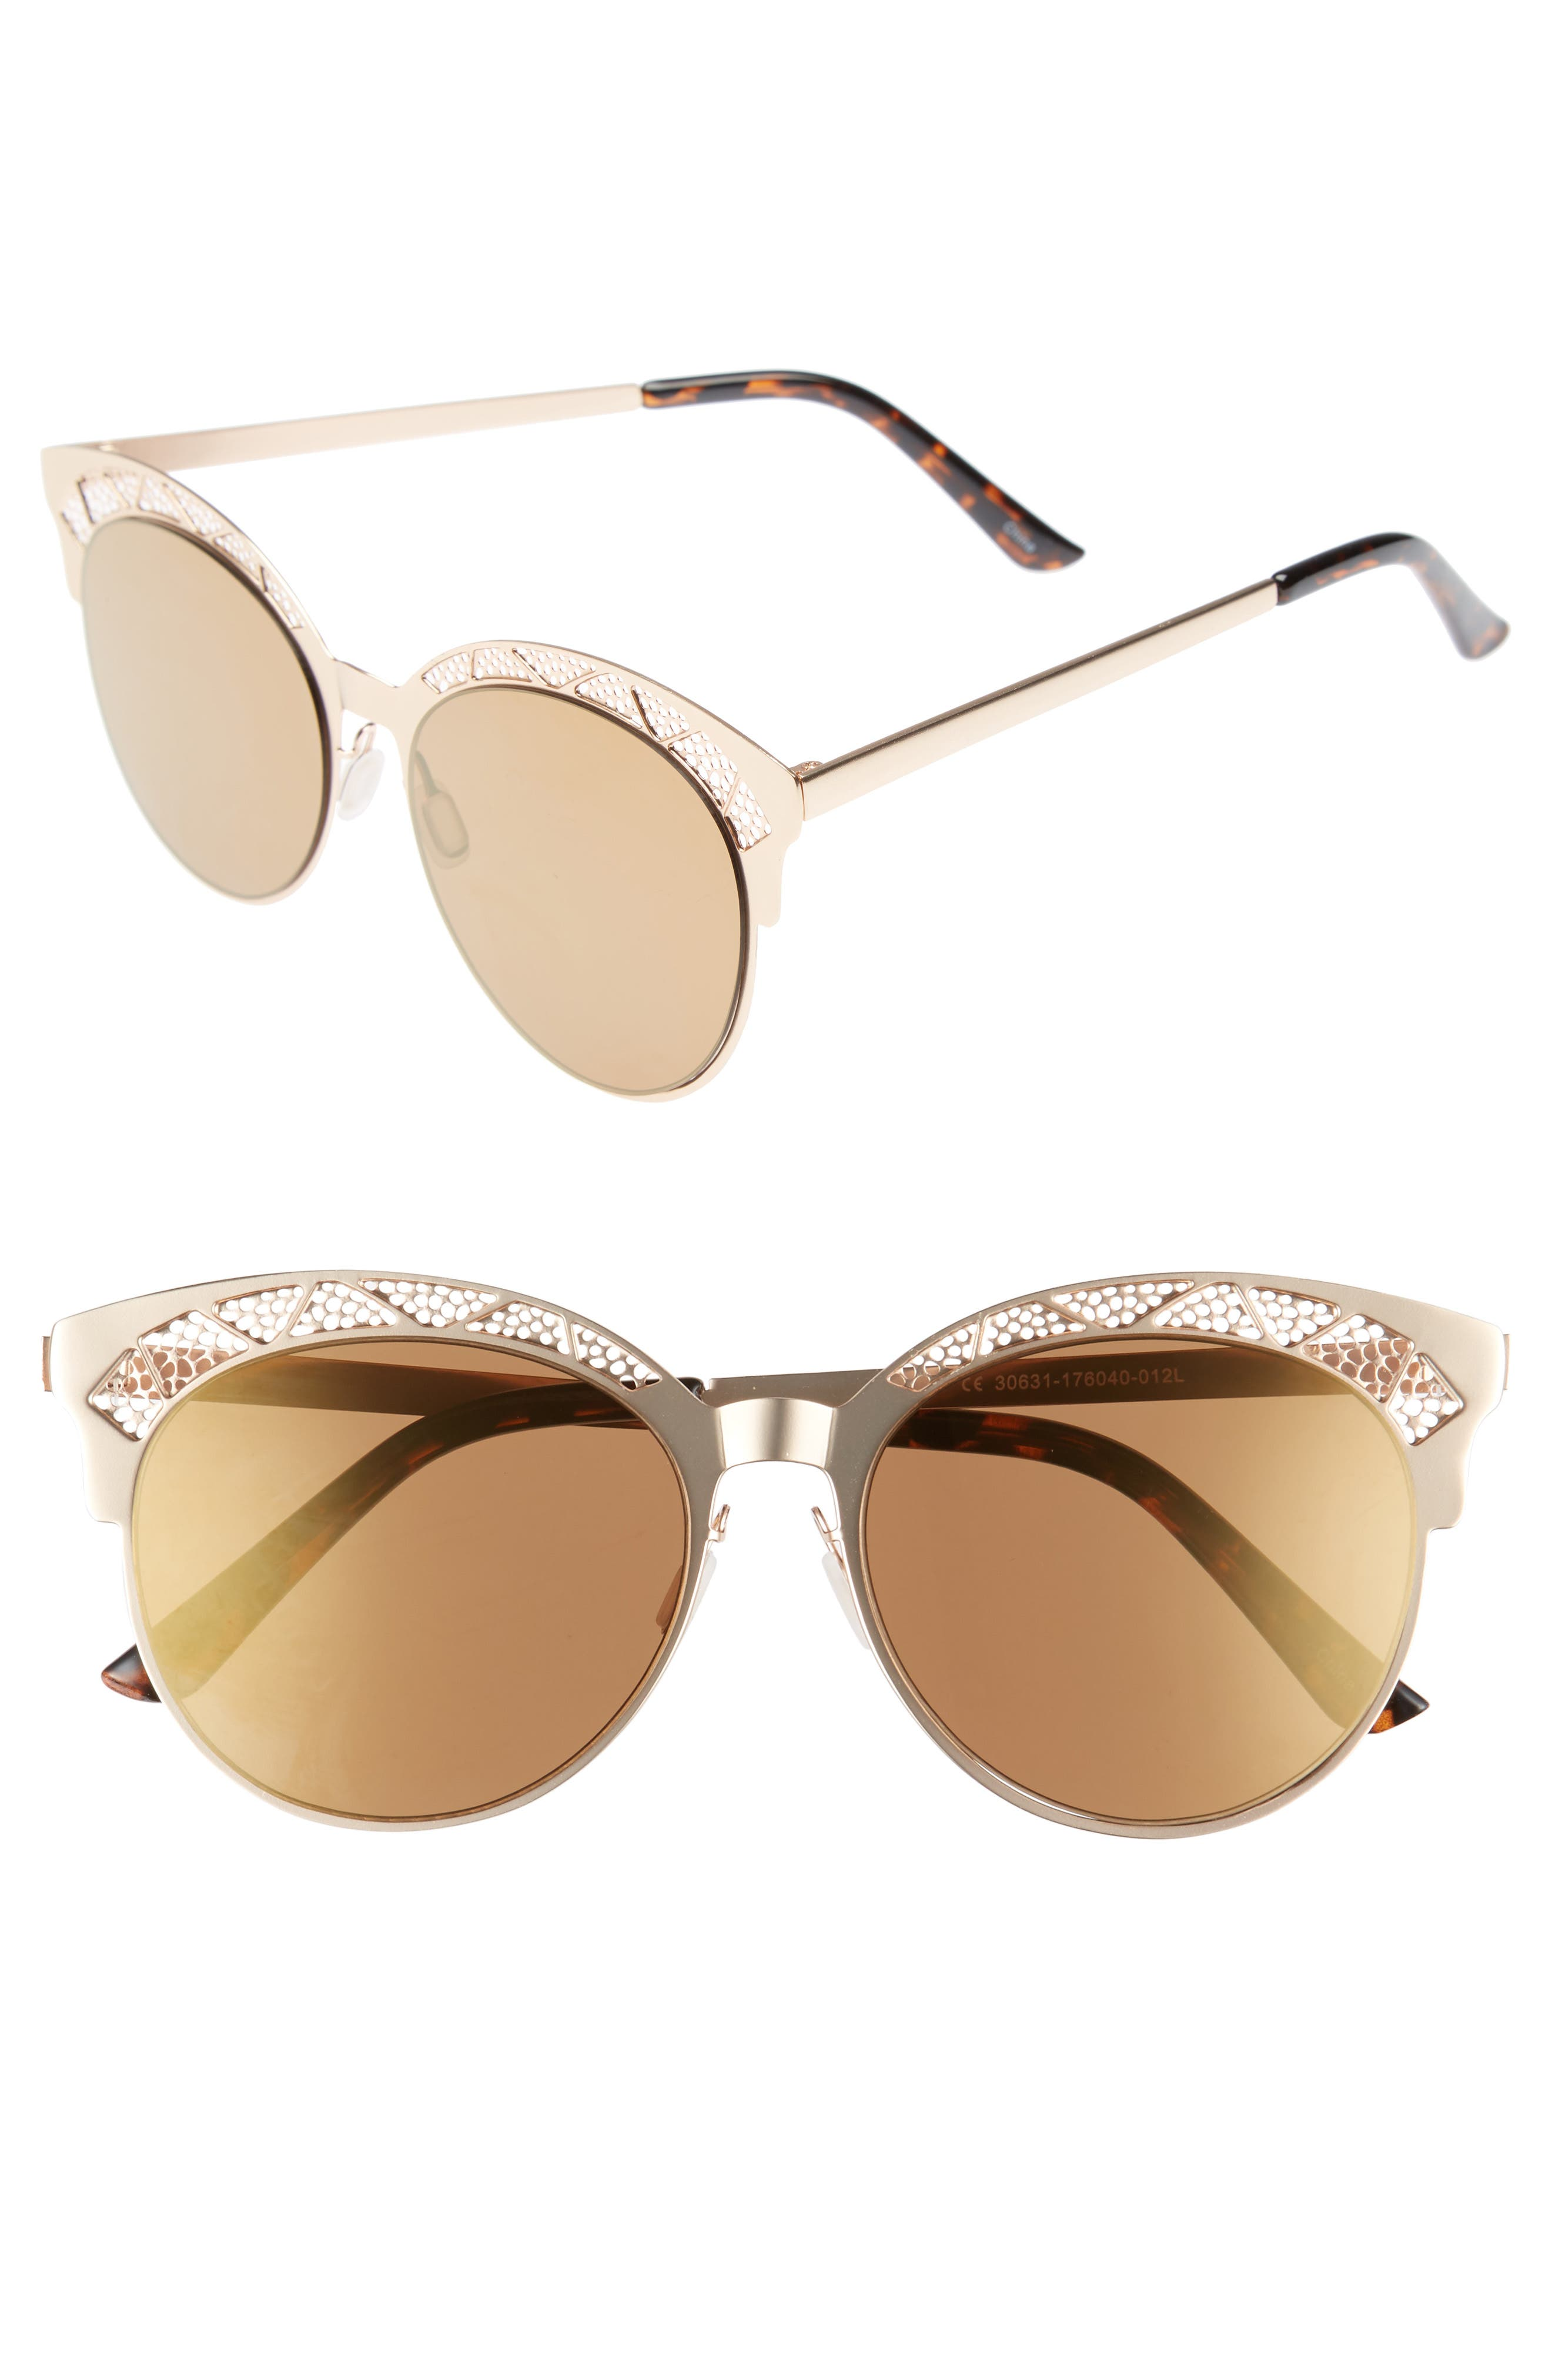 56mm Round Sunglasses,                         Main,                         color, 710